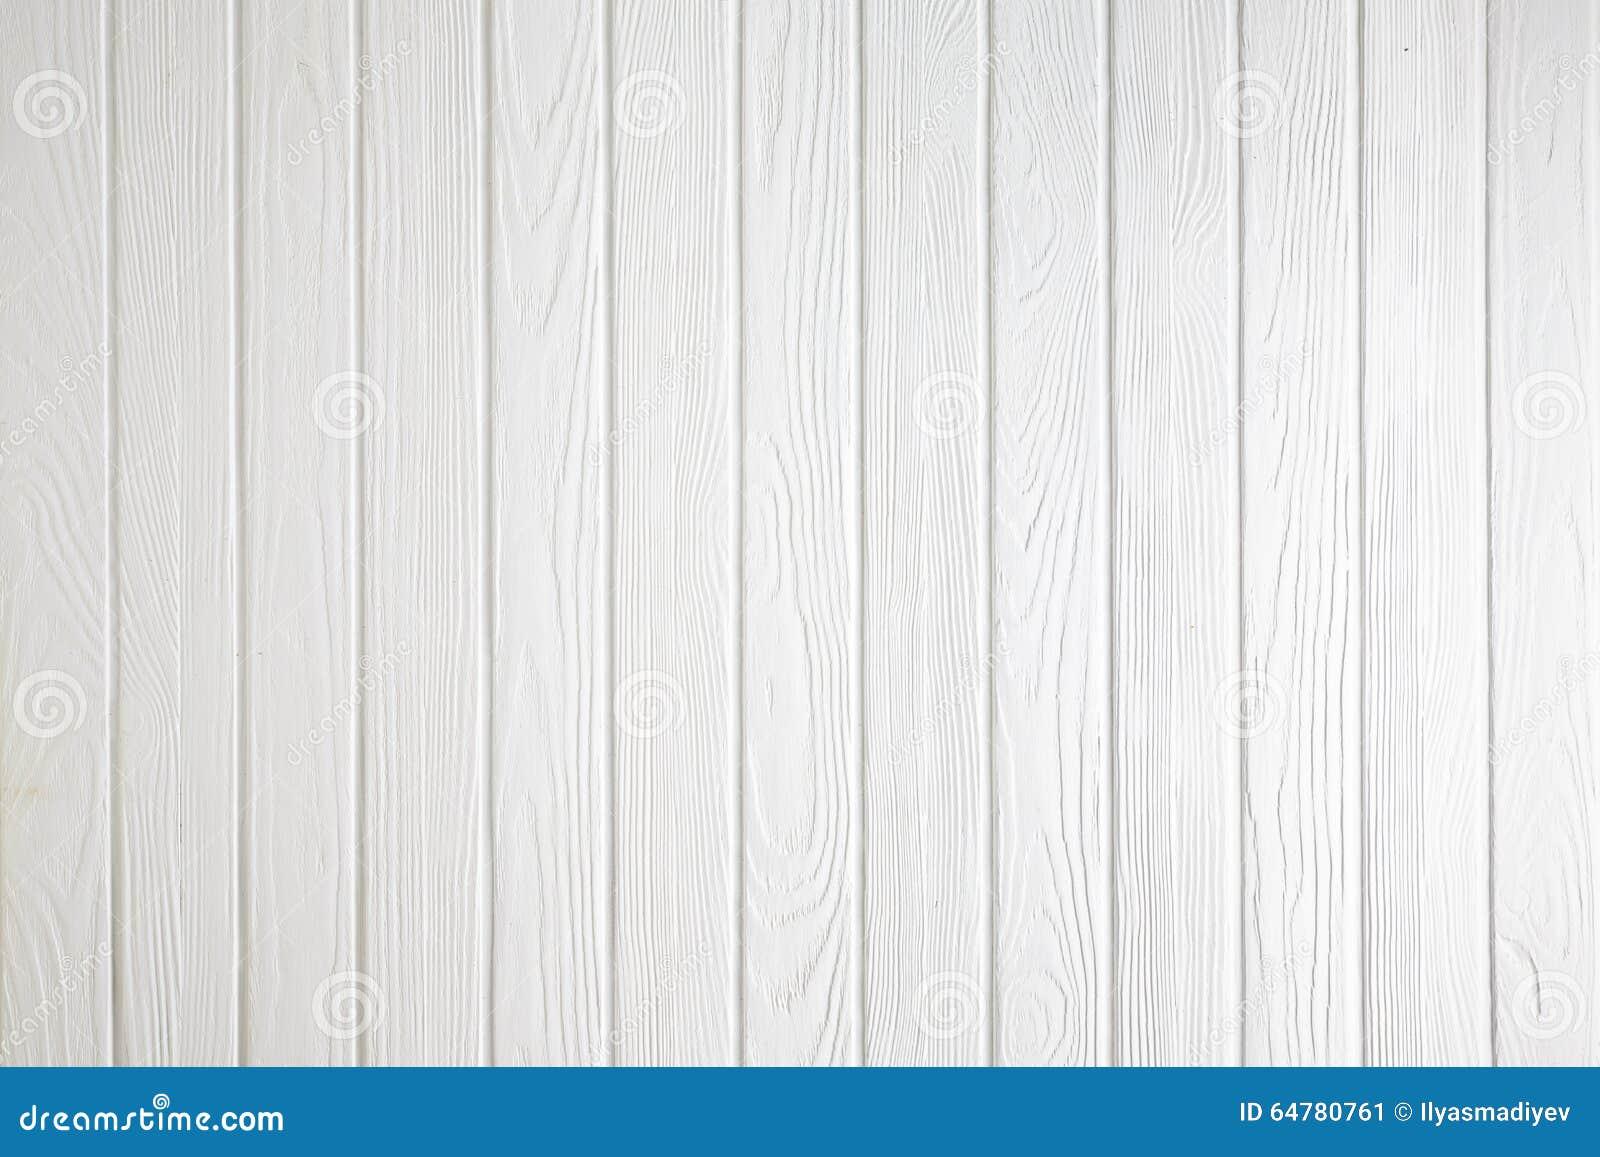 White Wood Texture Stock Photo Image 64780761